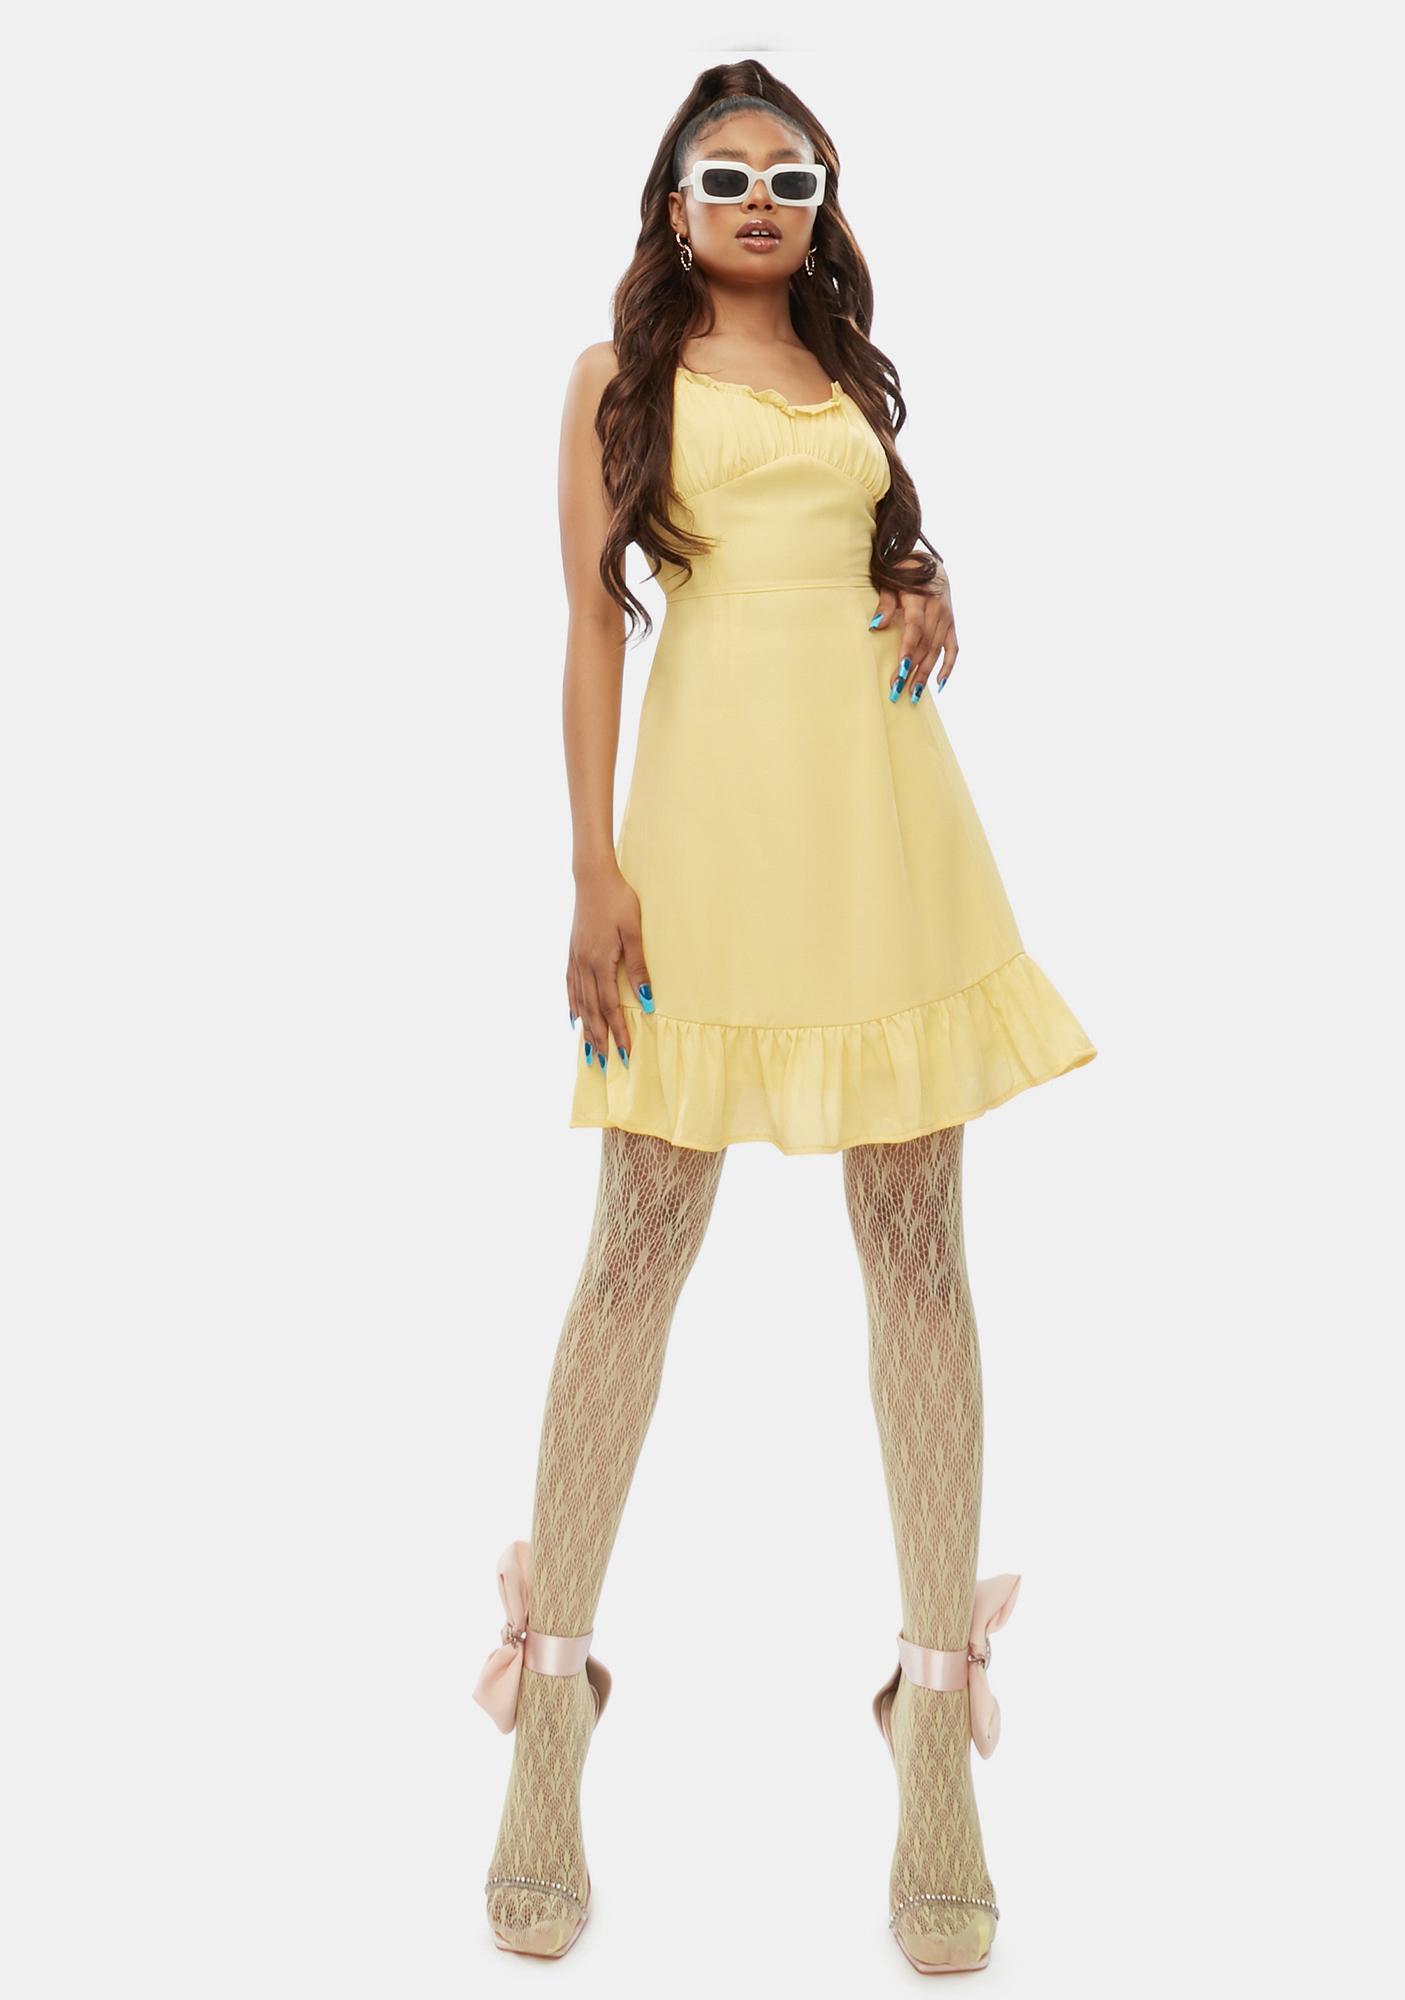 Sour No Promises Ruffle Tie Strap Mini Dress